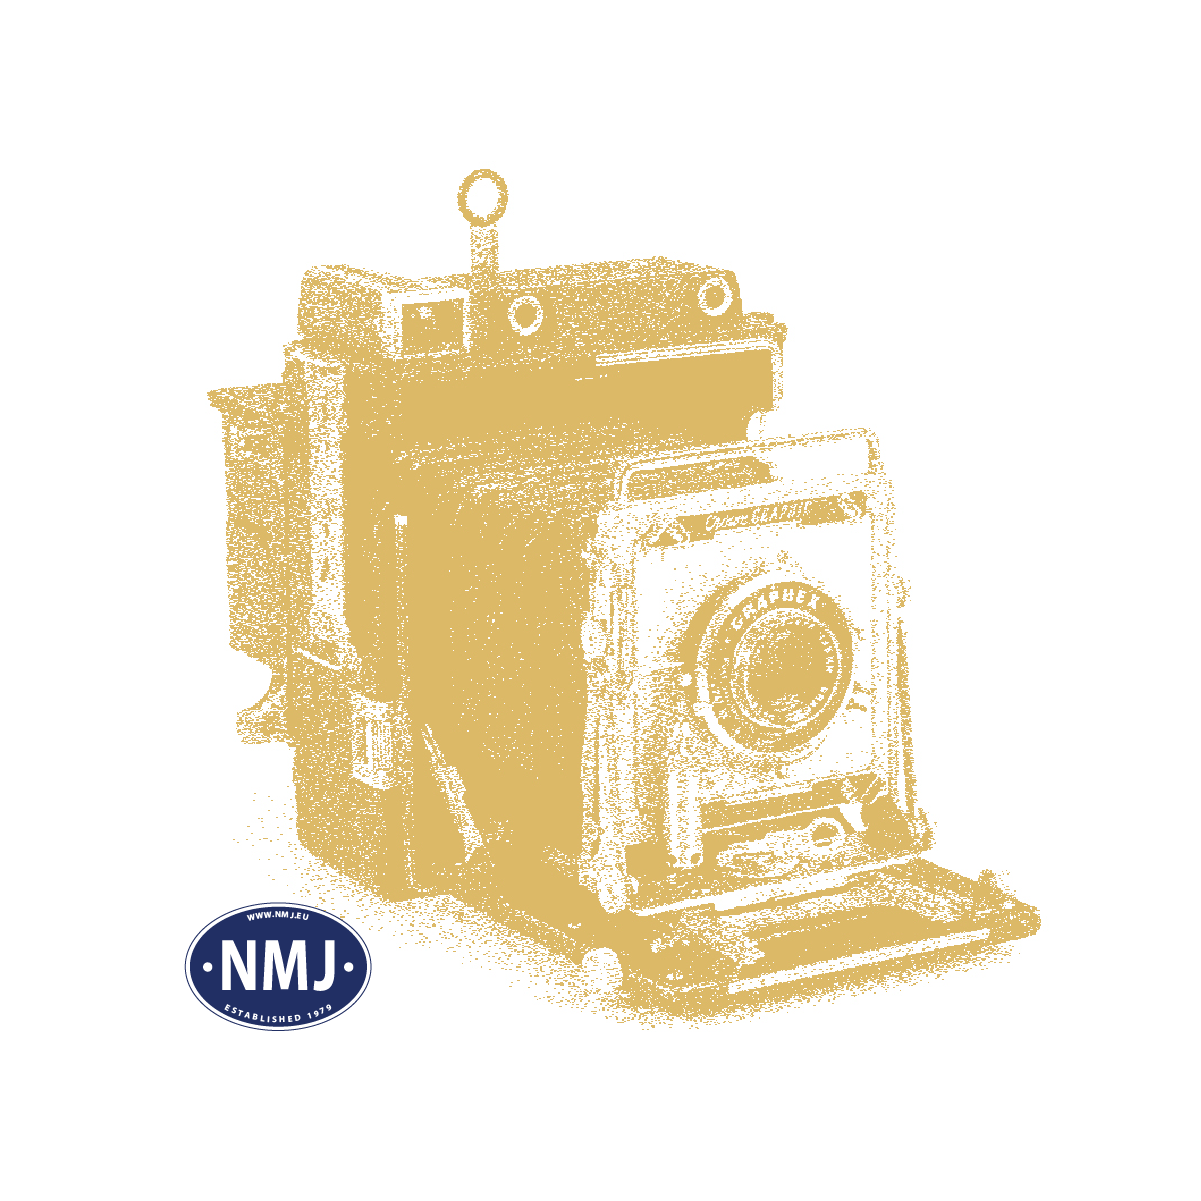 FAL180690 - Røykgeneratorsett, H0